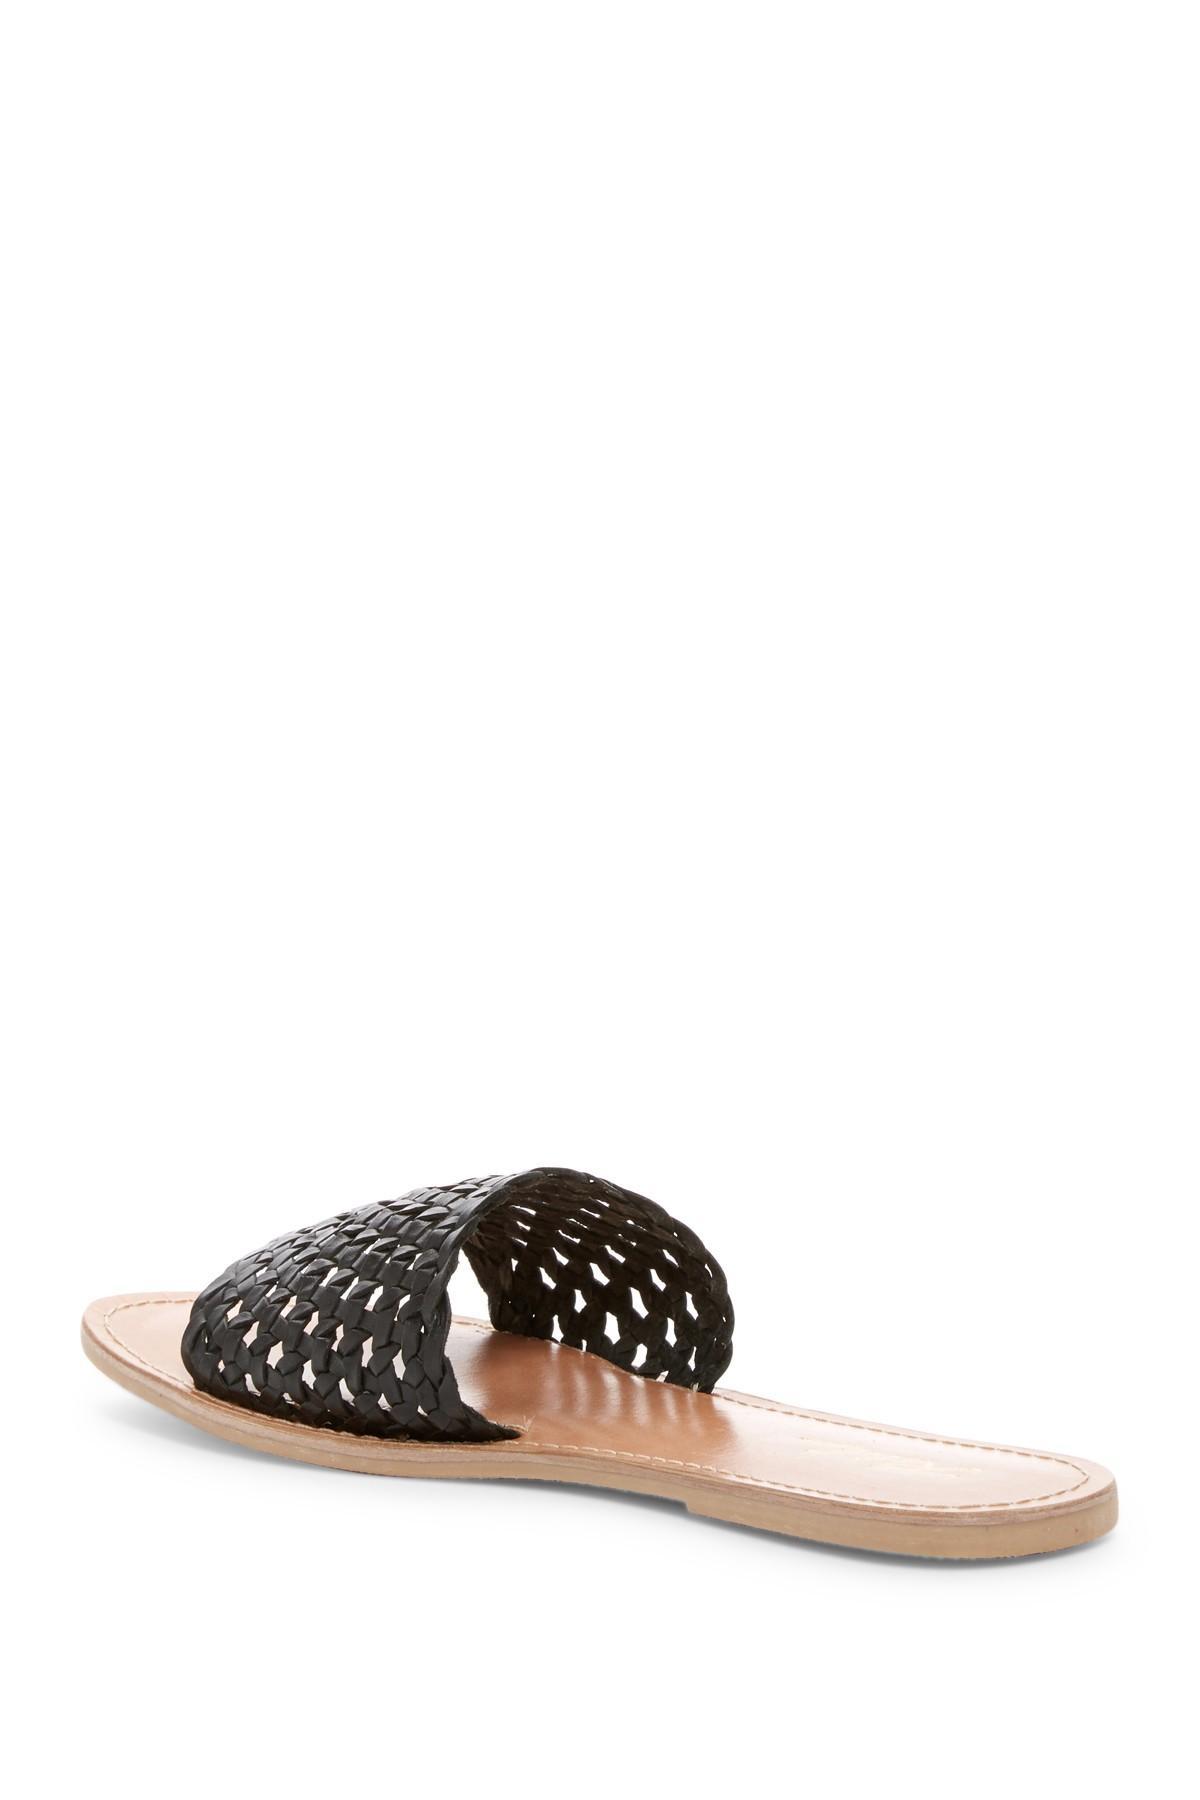 de927ebf7007 Rebels - Black Bettina Leather Lattice Slide Sandal - Lyst. View fullscreen